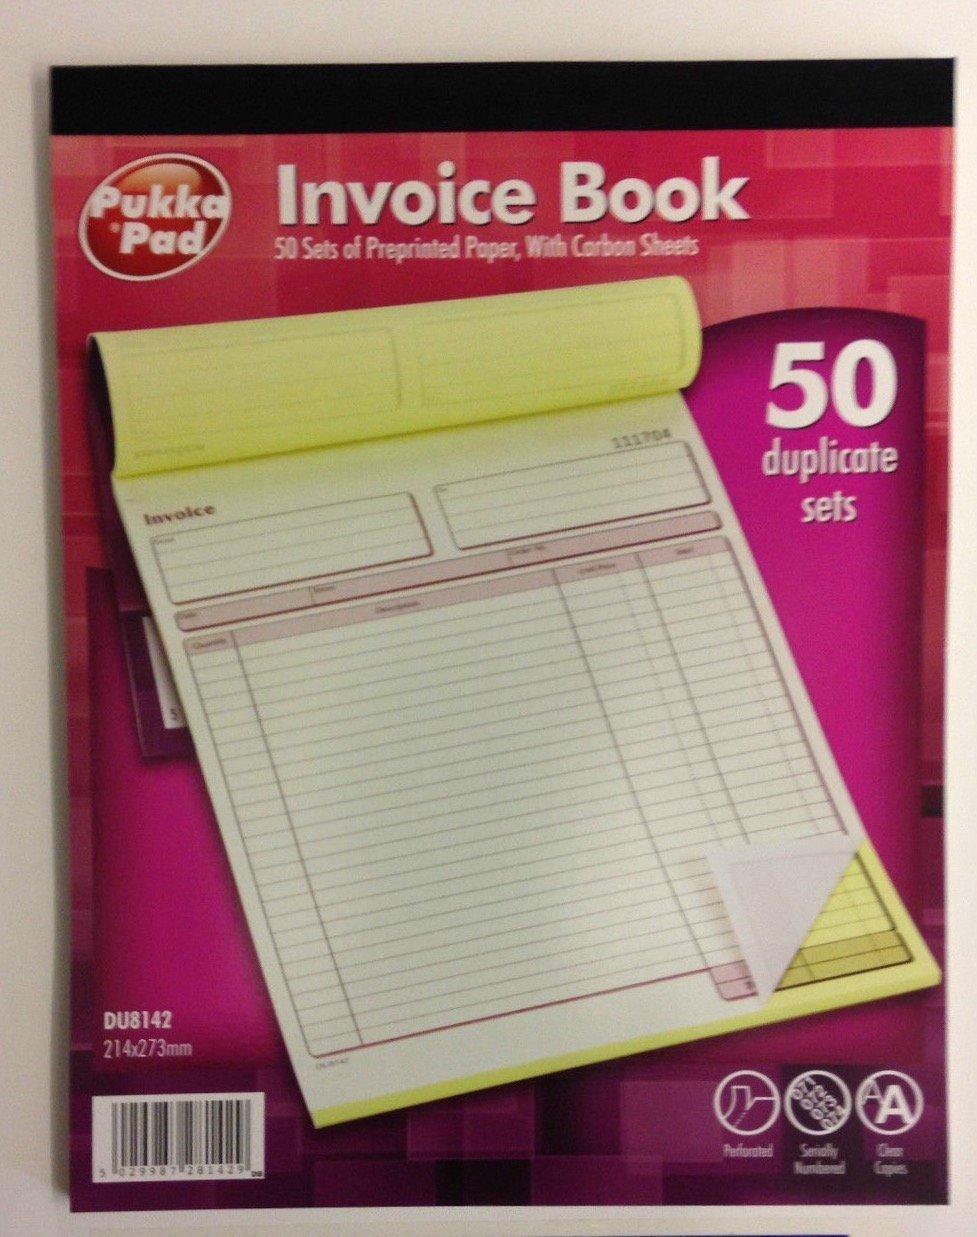 1x Pukka Pad A4 50 Set Duplicate Invoice Book With Carbon DU8142 Single Book 214x273mm